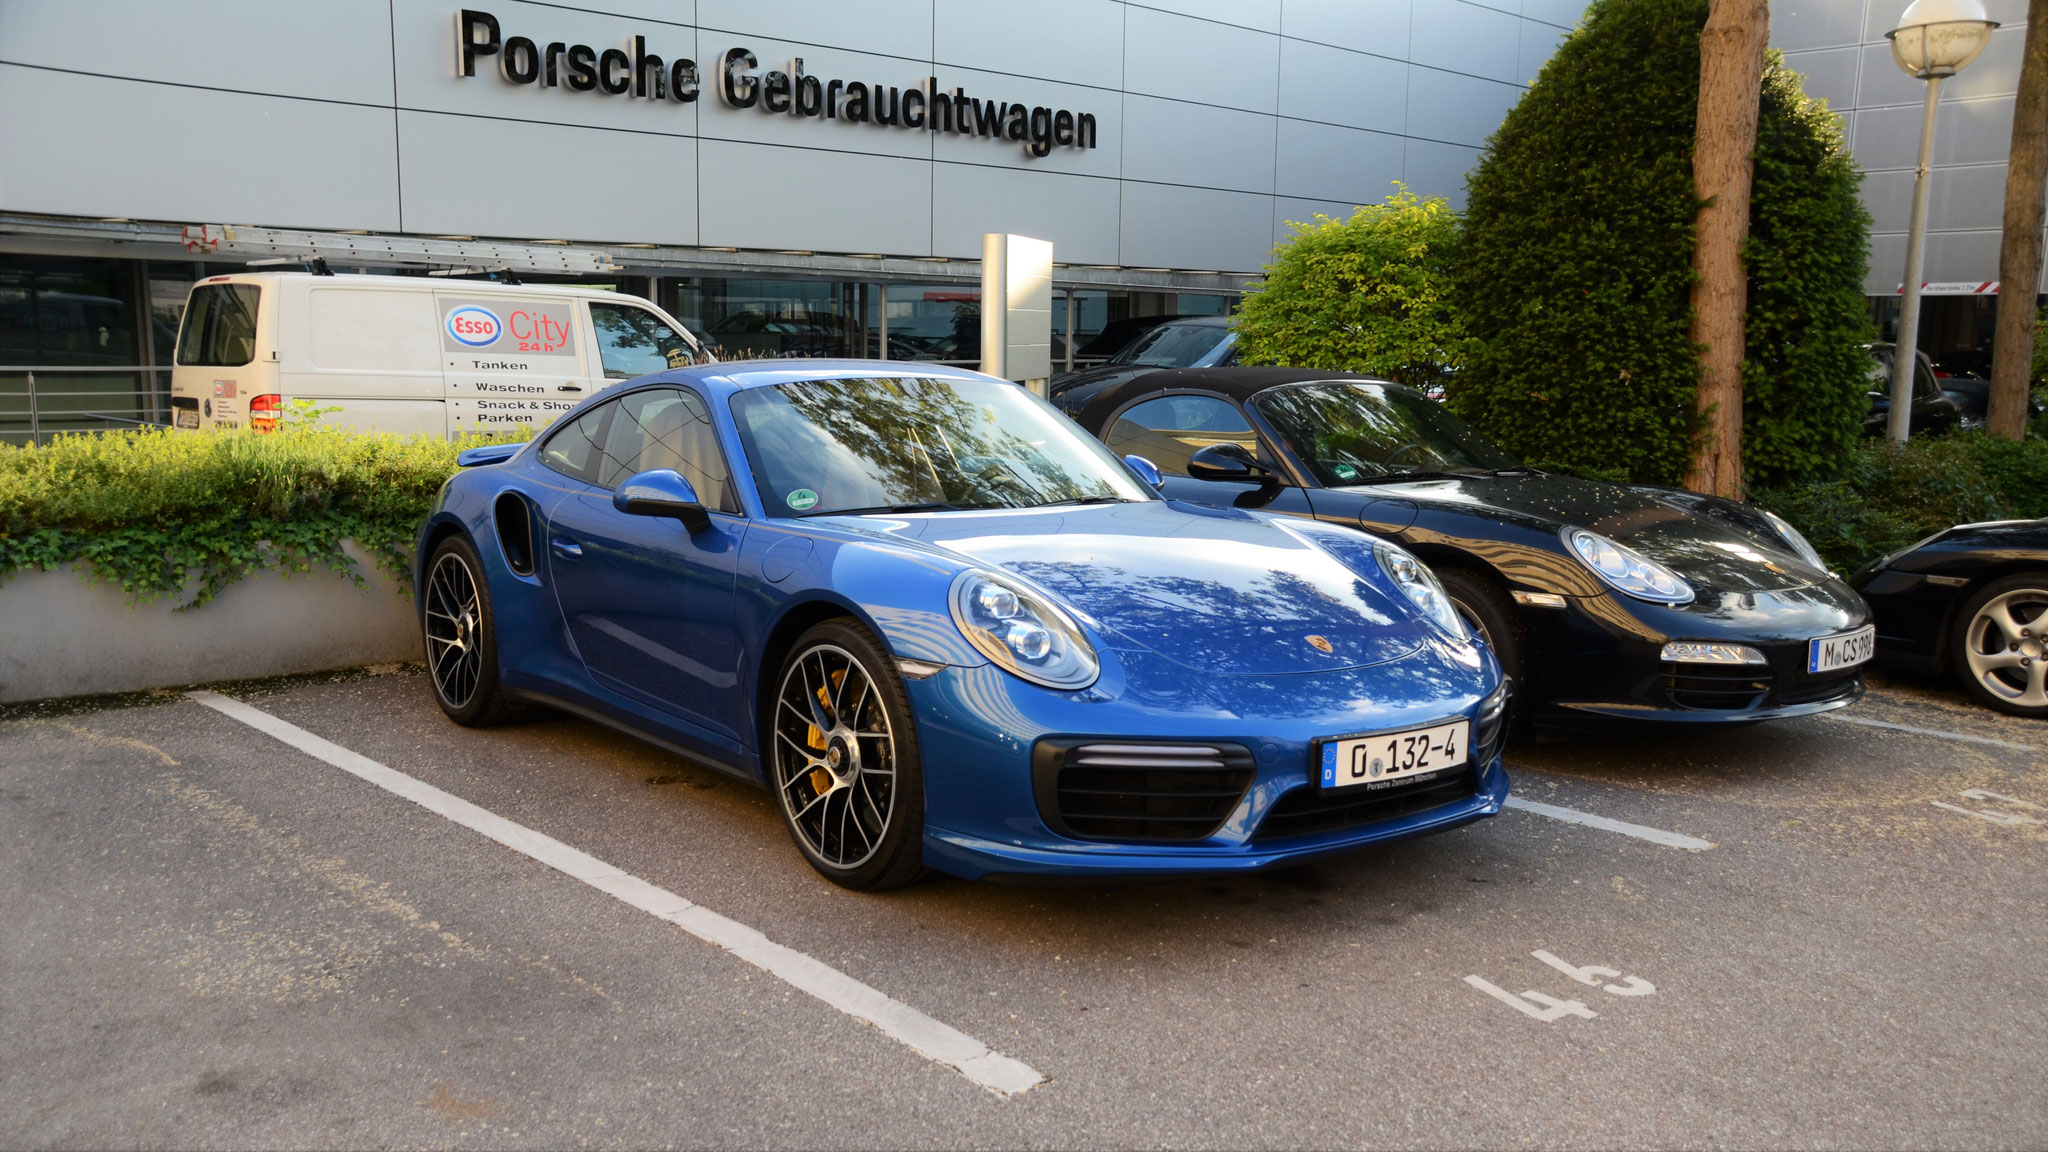 Porsche 911 Turbo S - 0-132-4